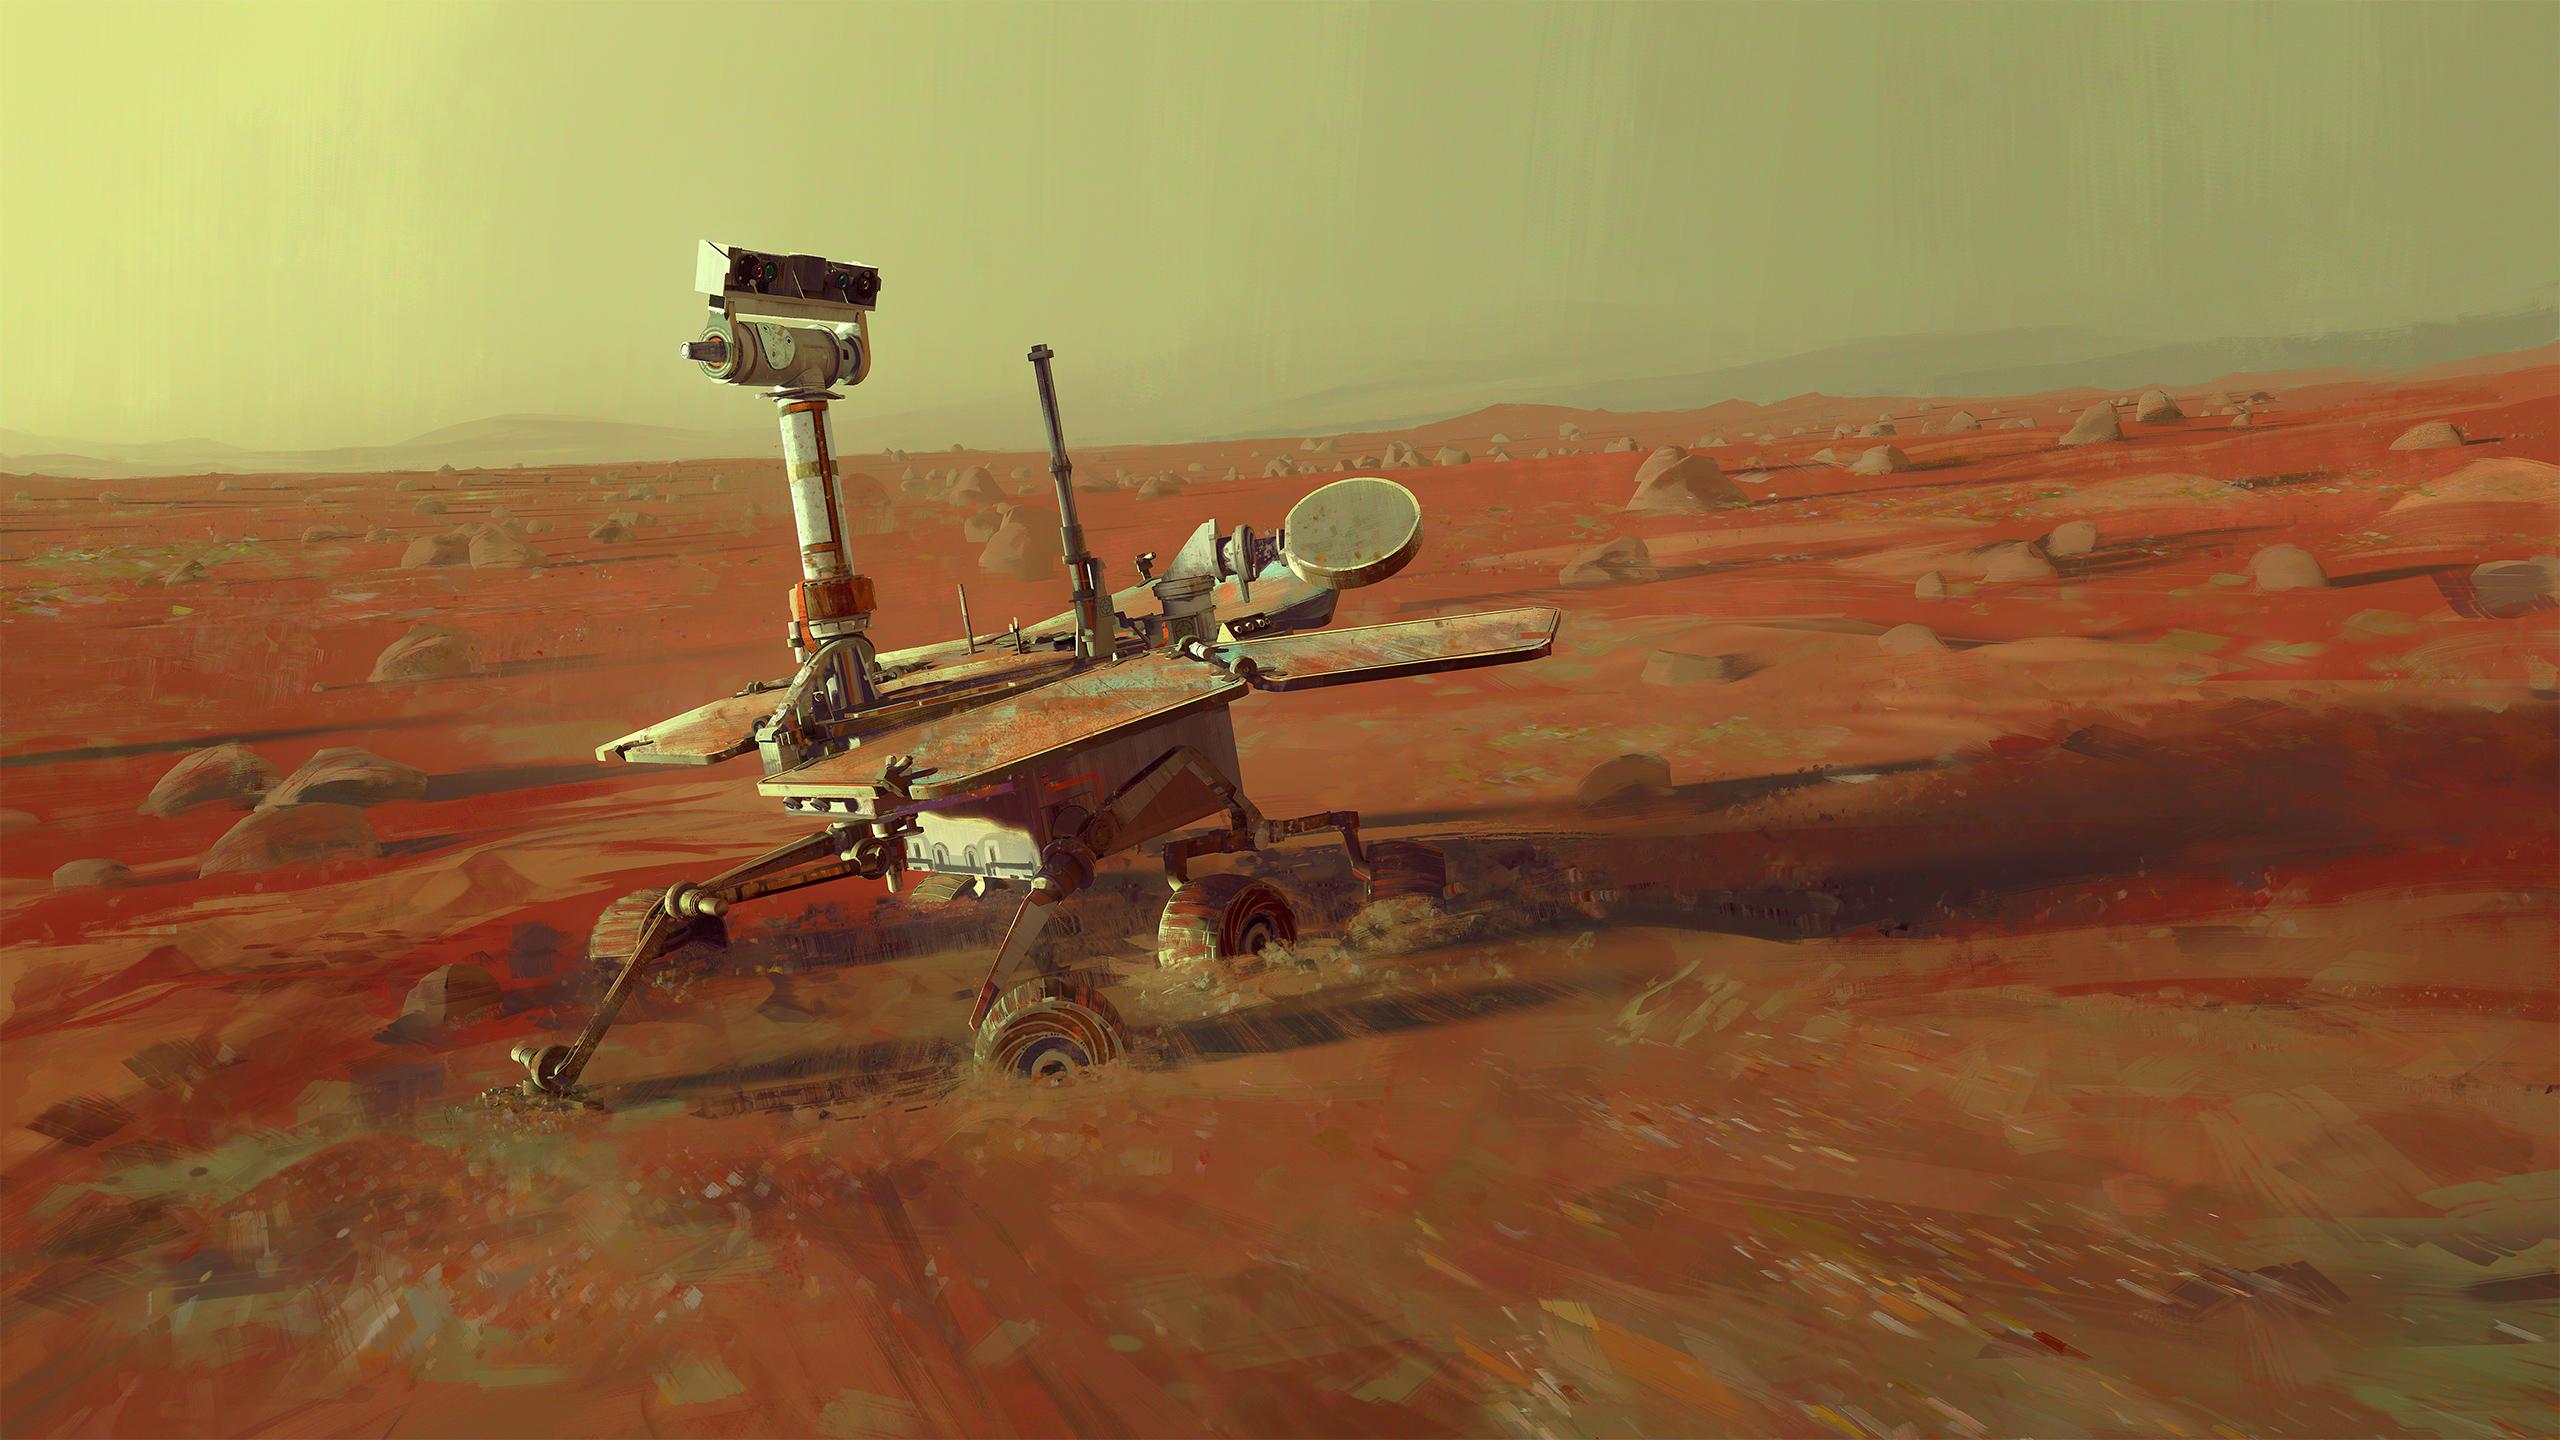 Mars Exploration Rover A - Spirit by MacRebisz